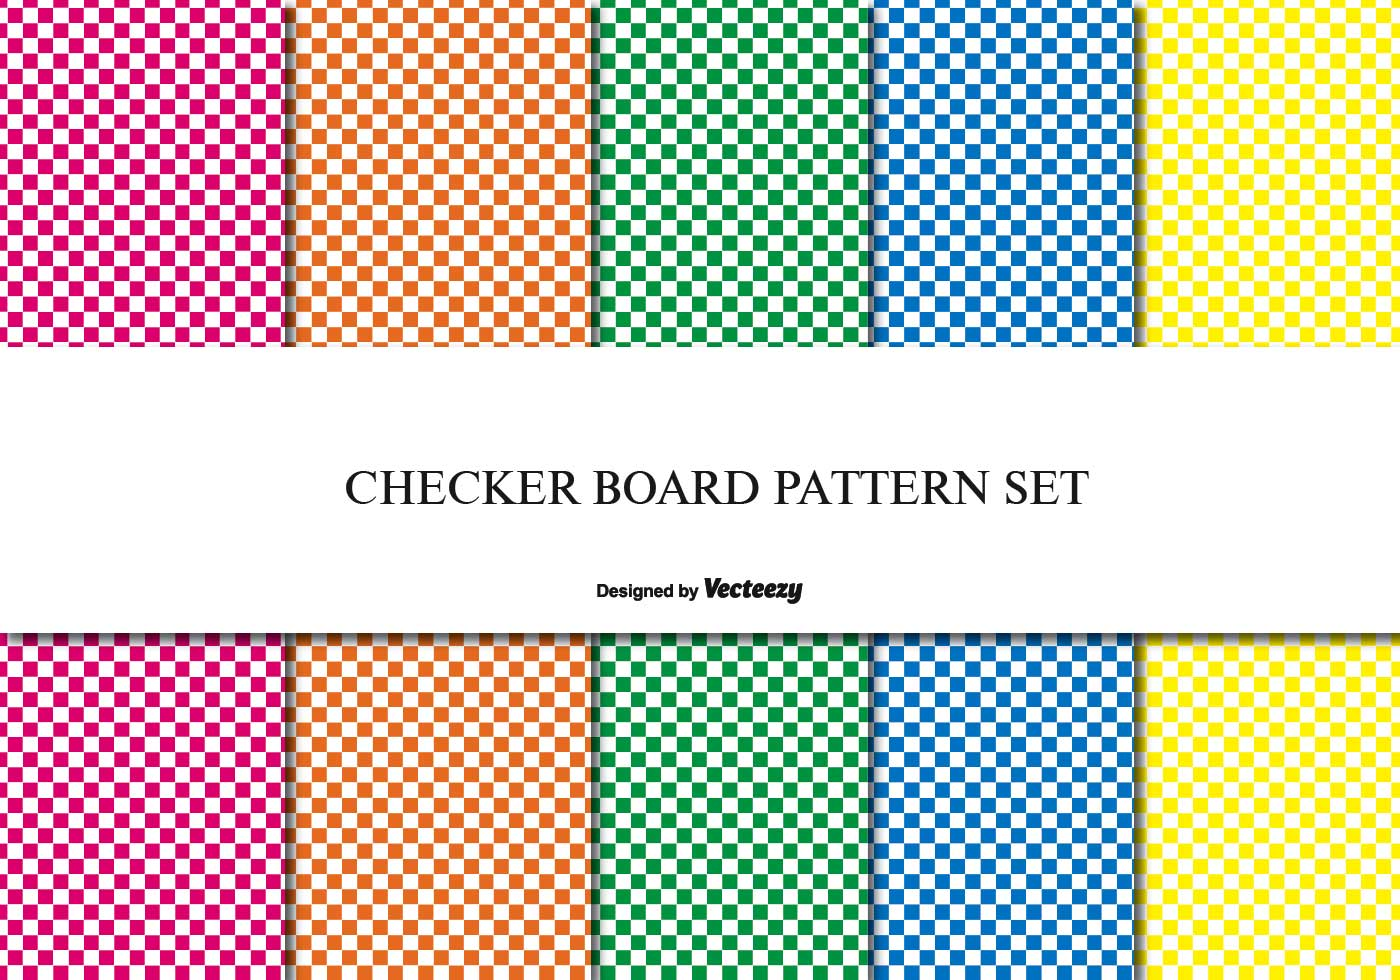 Checker Board Pattern Set Download Free Vector Art